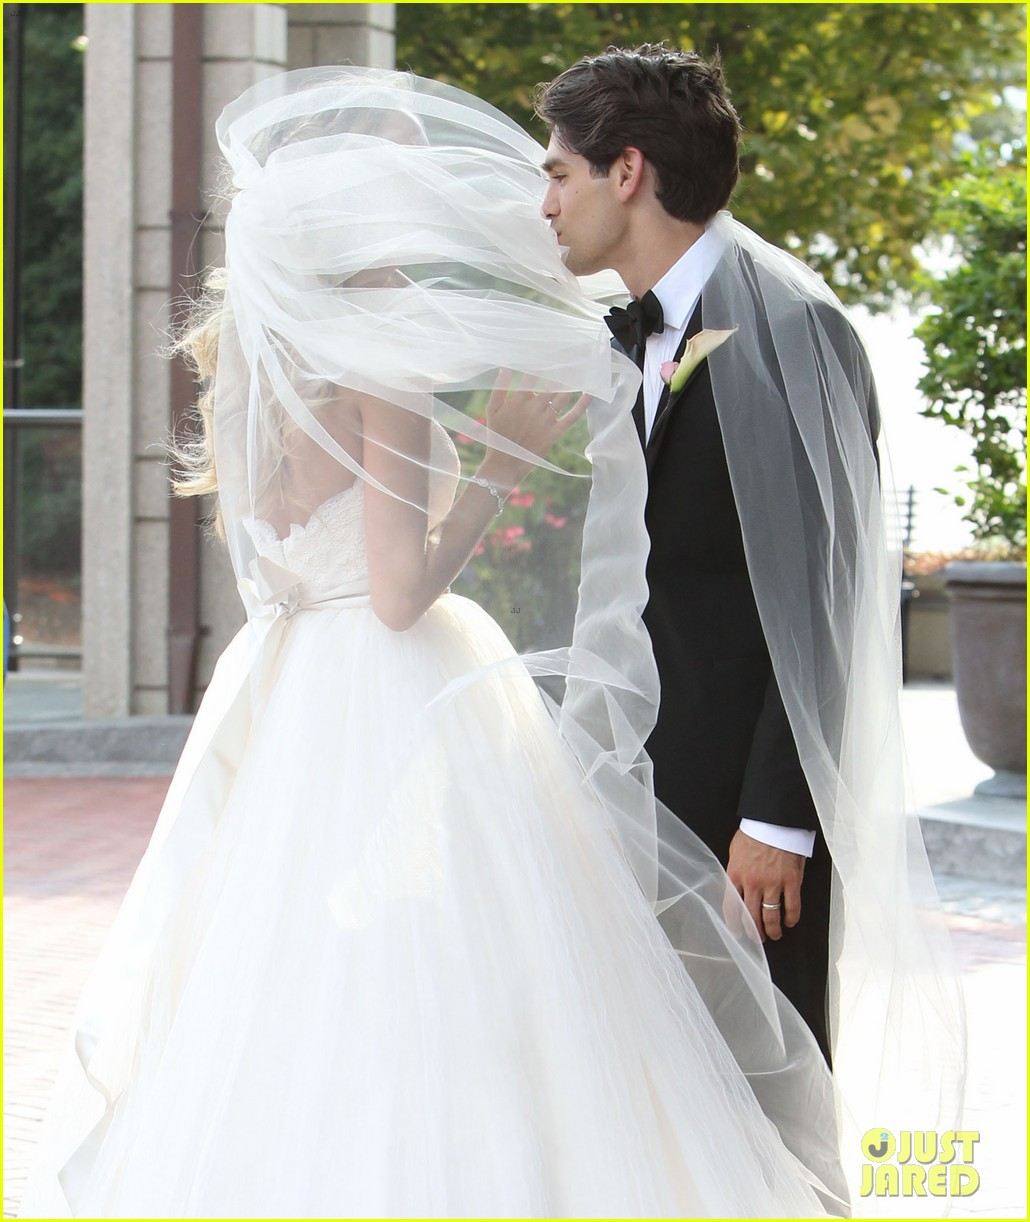 Melissa pantano wedding